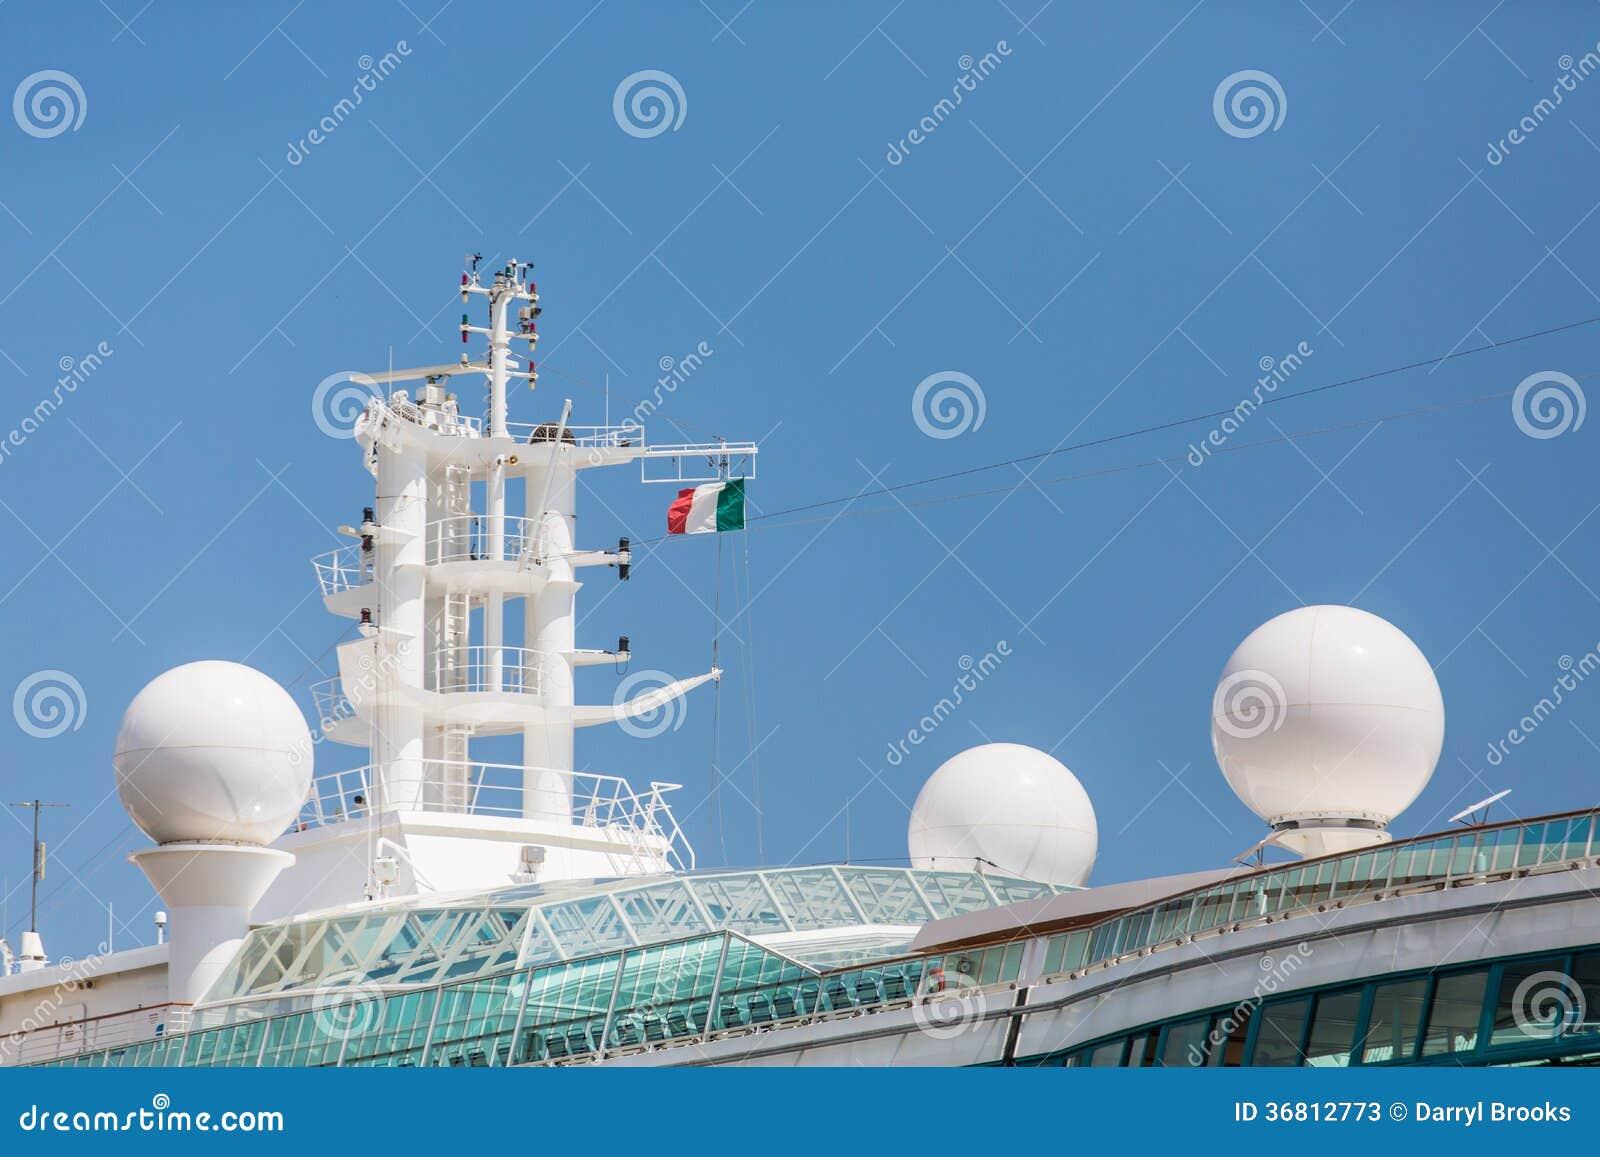 Satellite Equipment On Cruise Ship Under Italian Flag